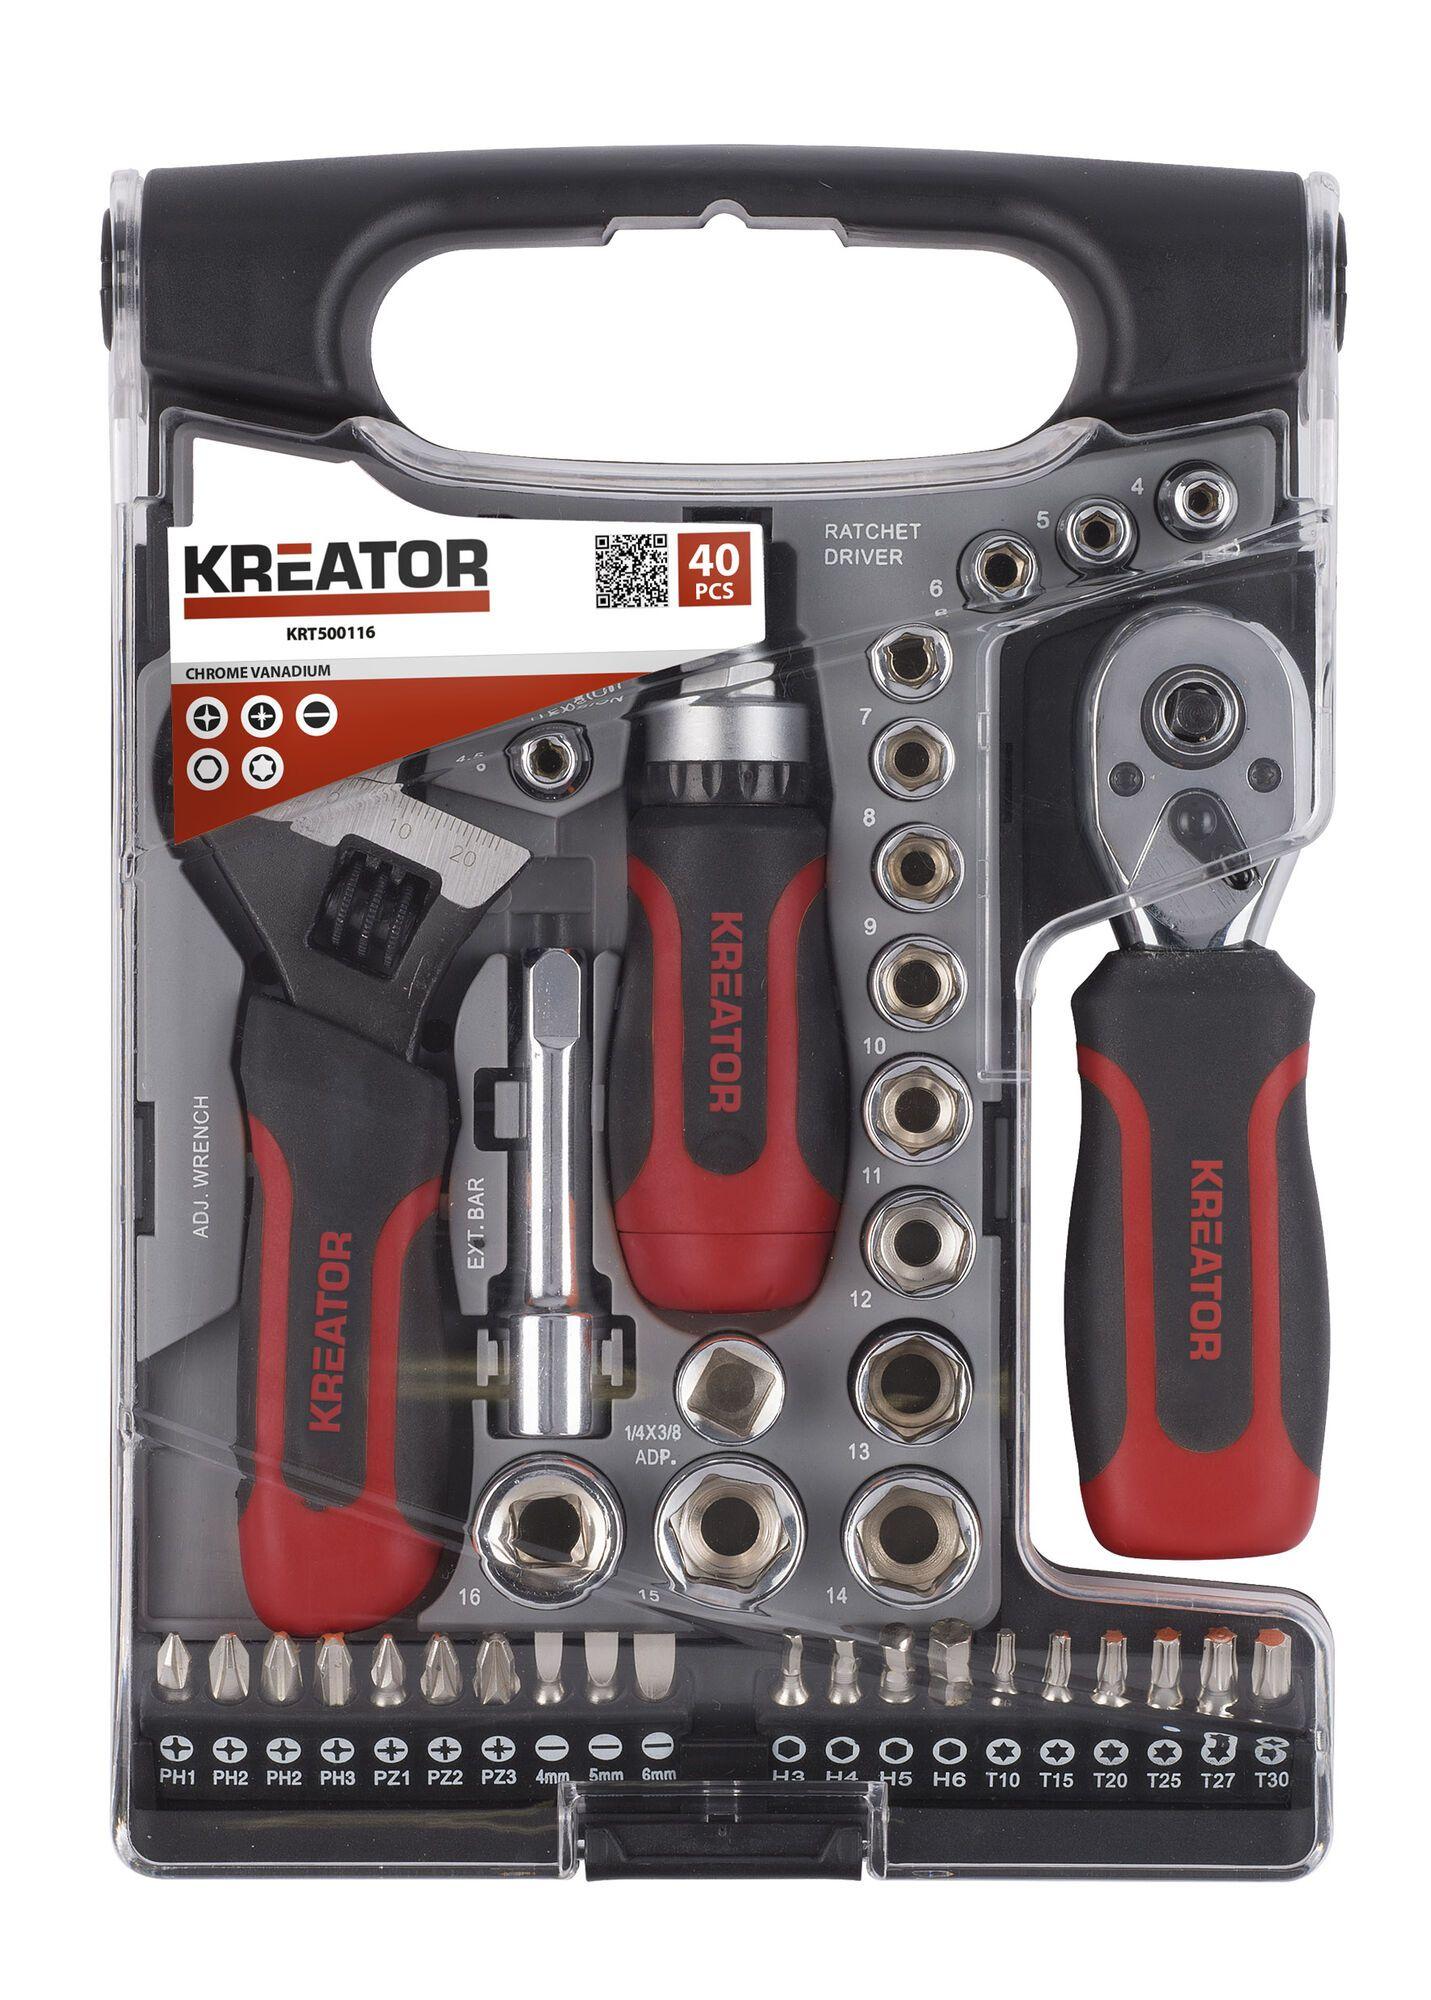 "Kreator KRT500115 28-delige Dopsleutelset 1/4"" - ratelsleutel"